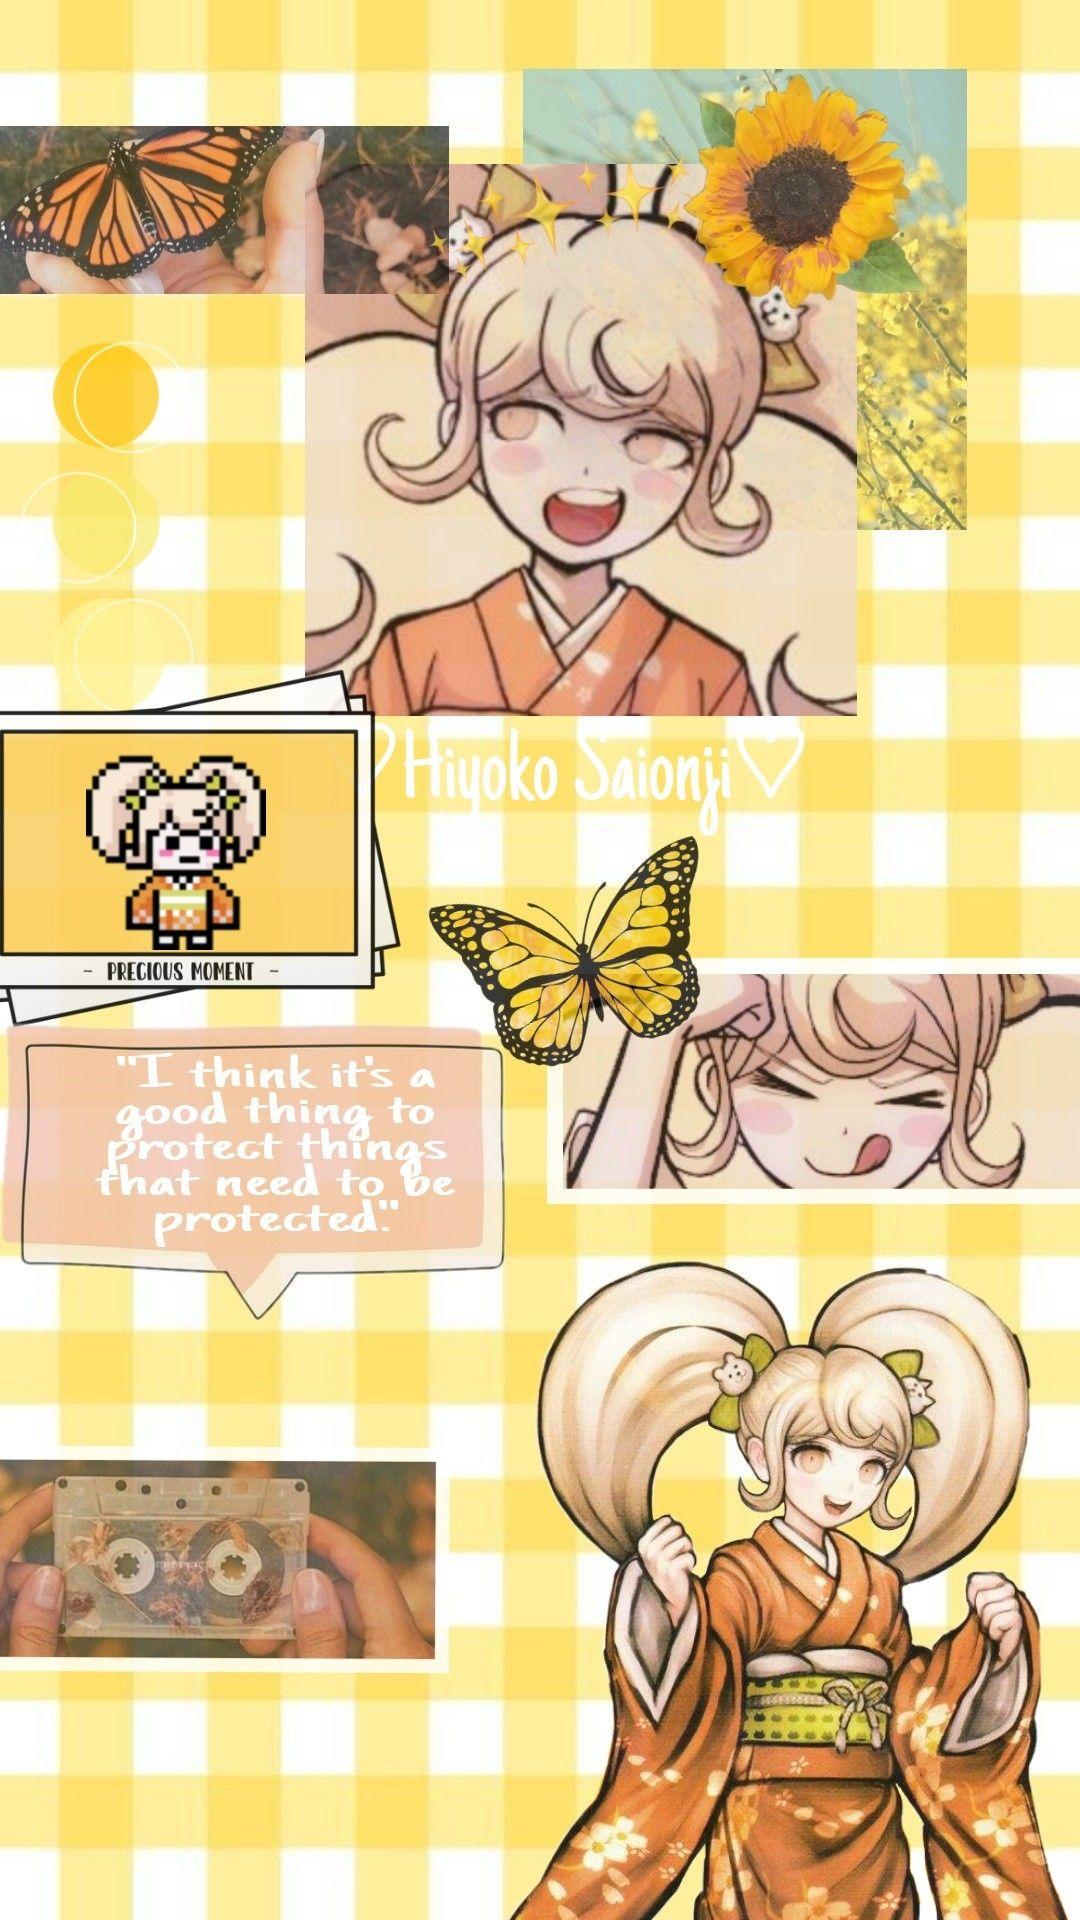 Hiyoko Saionji Wallpaper Aesthetic Anime Edgy Wallpaper Danganronpa